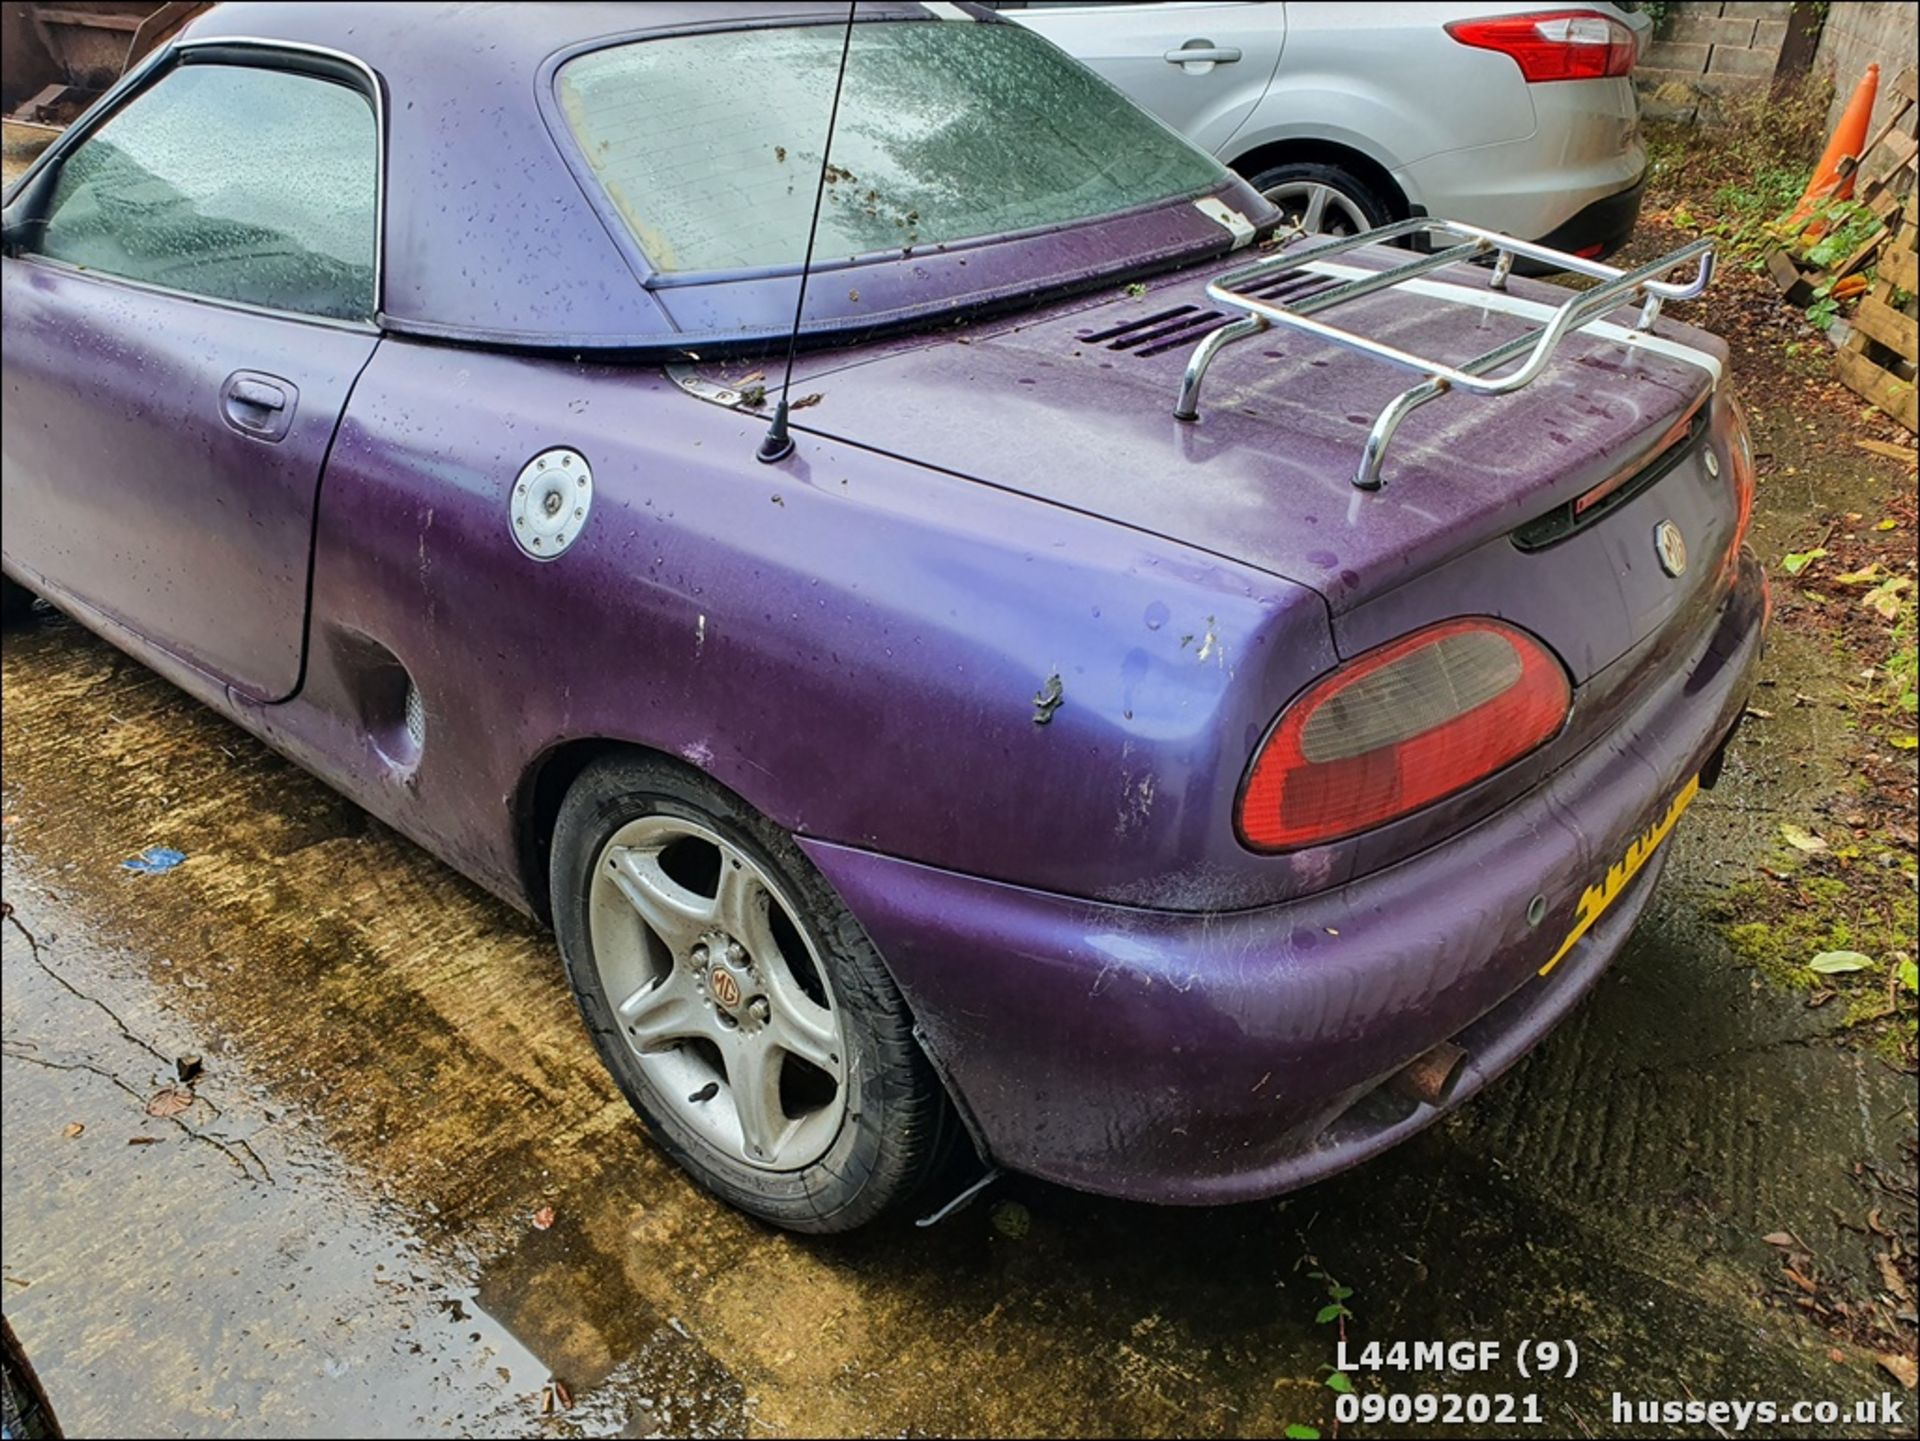 1996 MG MGF 1.8I VVC - 1796cc 2dr Convertible (Mauve/purple) - Image 8 of 12